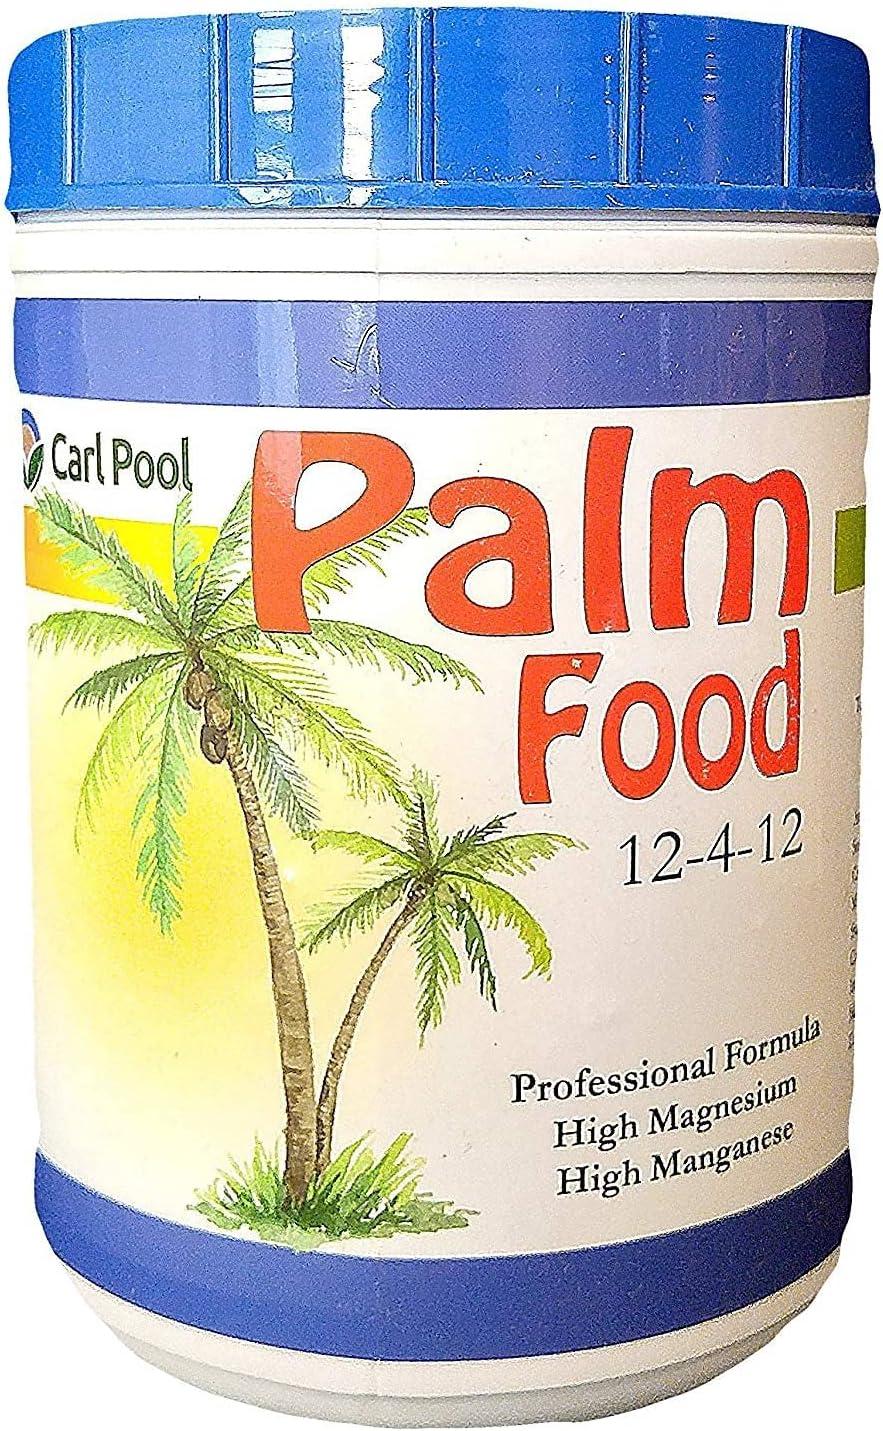 Carl Pool Thanos Palm Elegant Lbs Food 4 Bargain 12-4-12